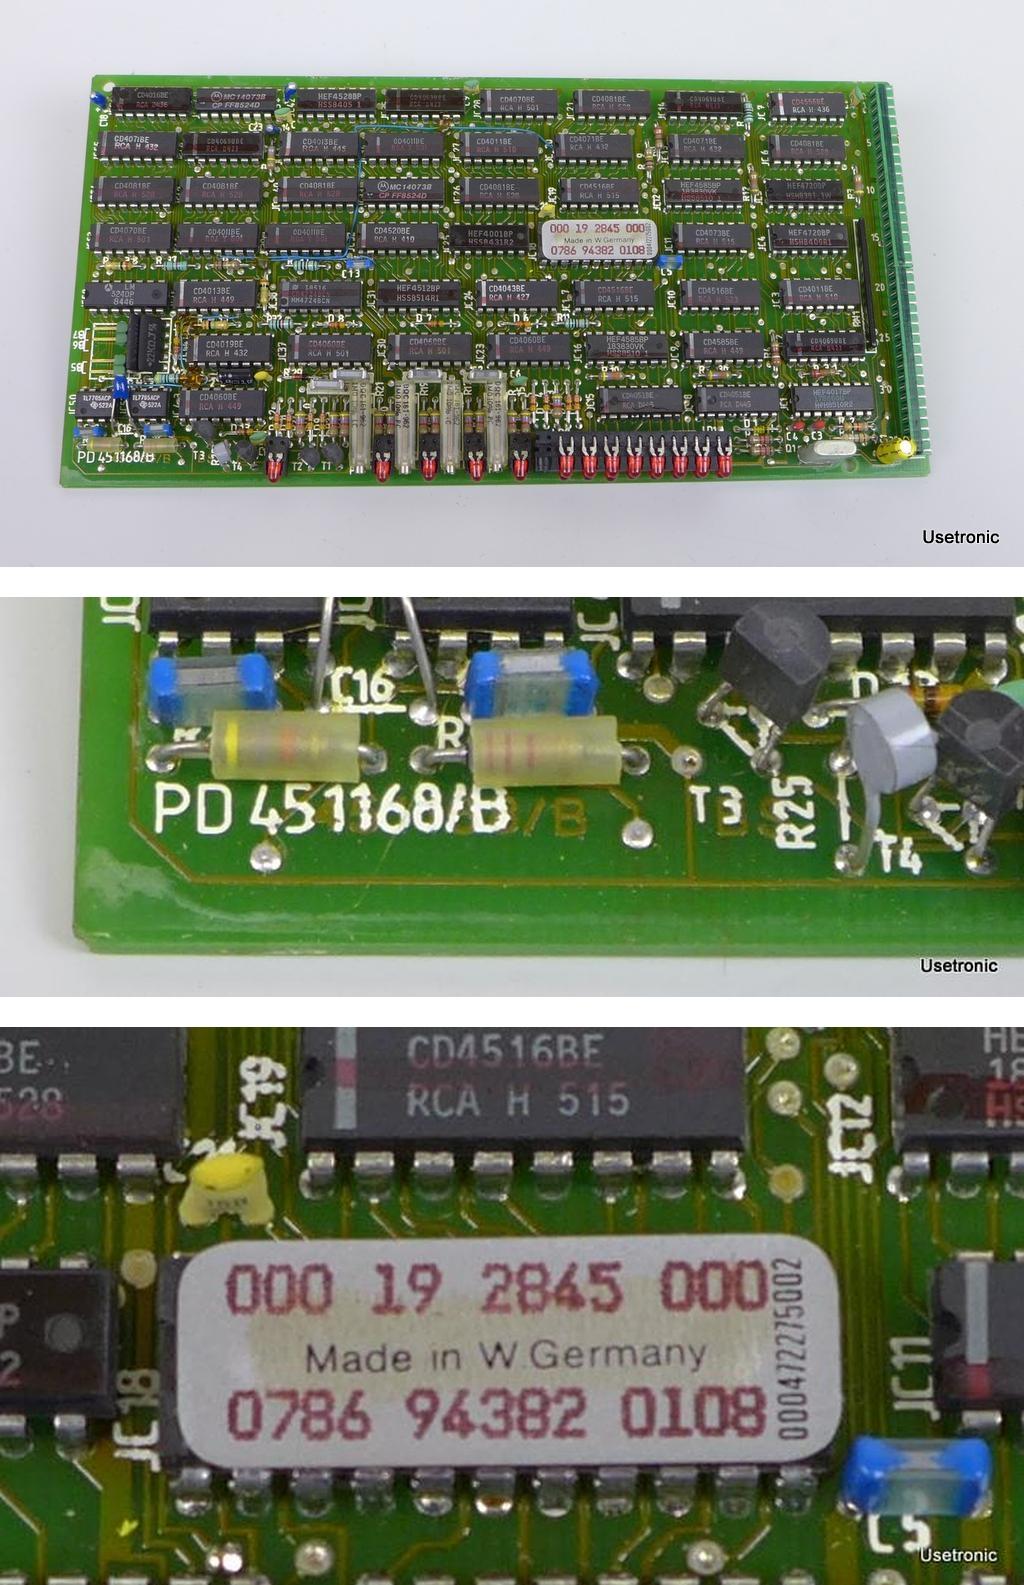 Eberle PD 451168/B 000192845000